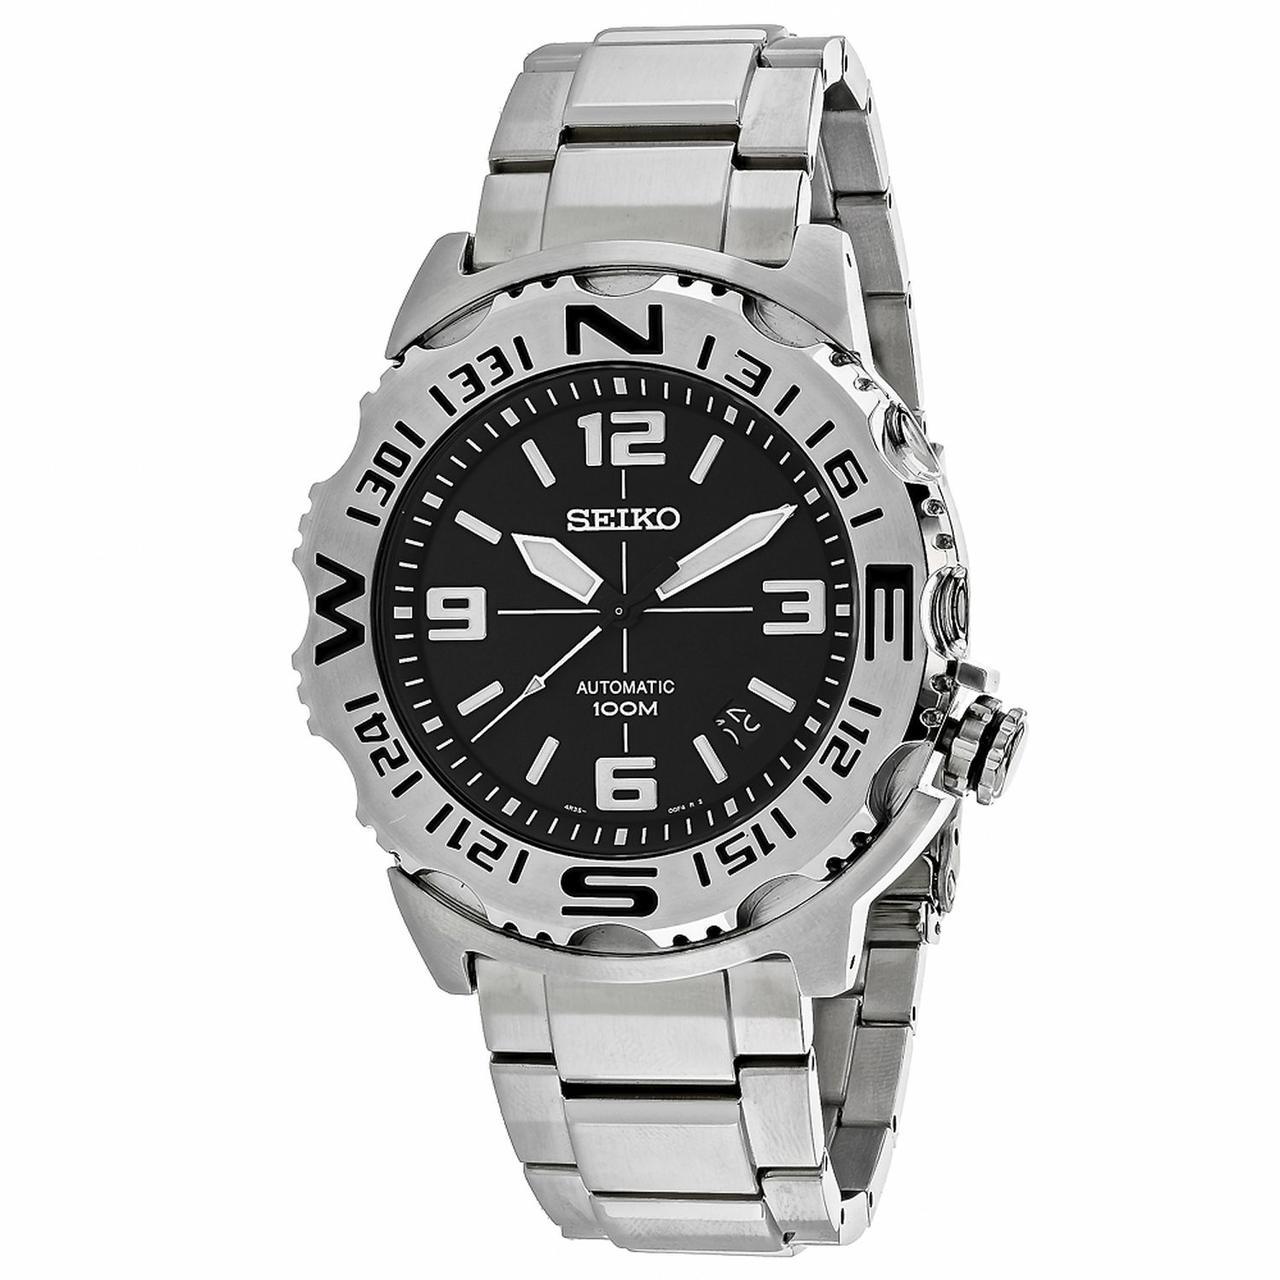 Часы Seiko Superior SRP441K1 Prospex 4R35 Automatic